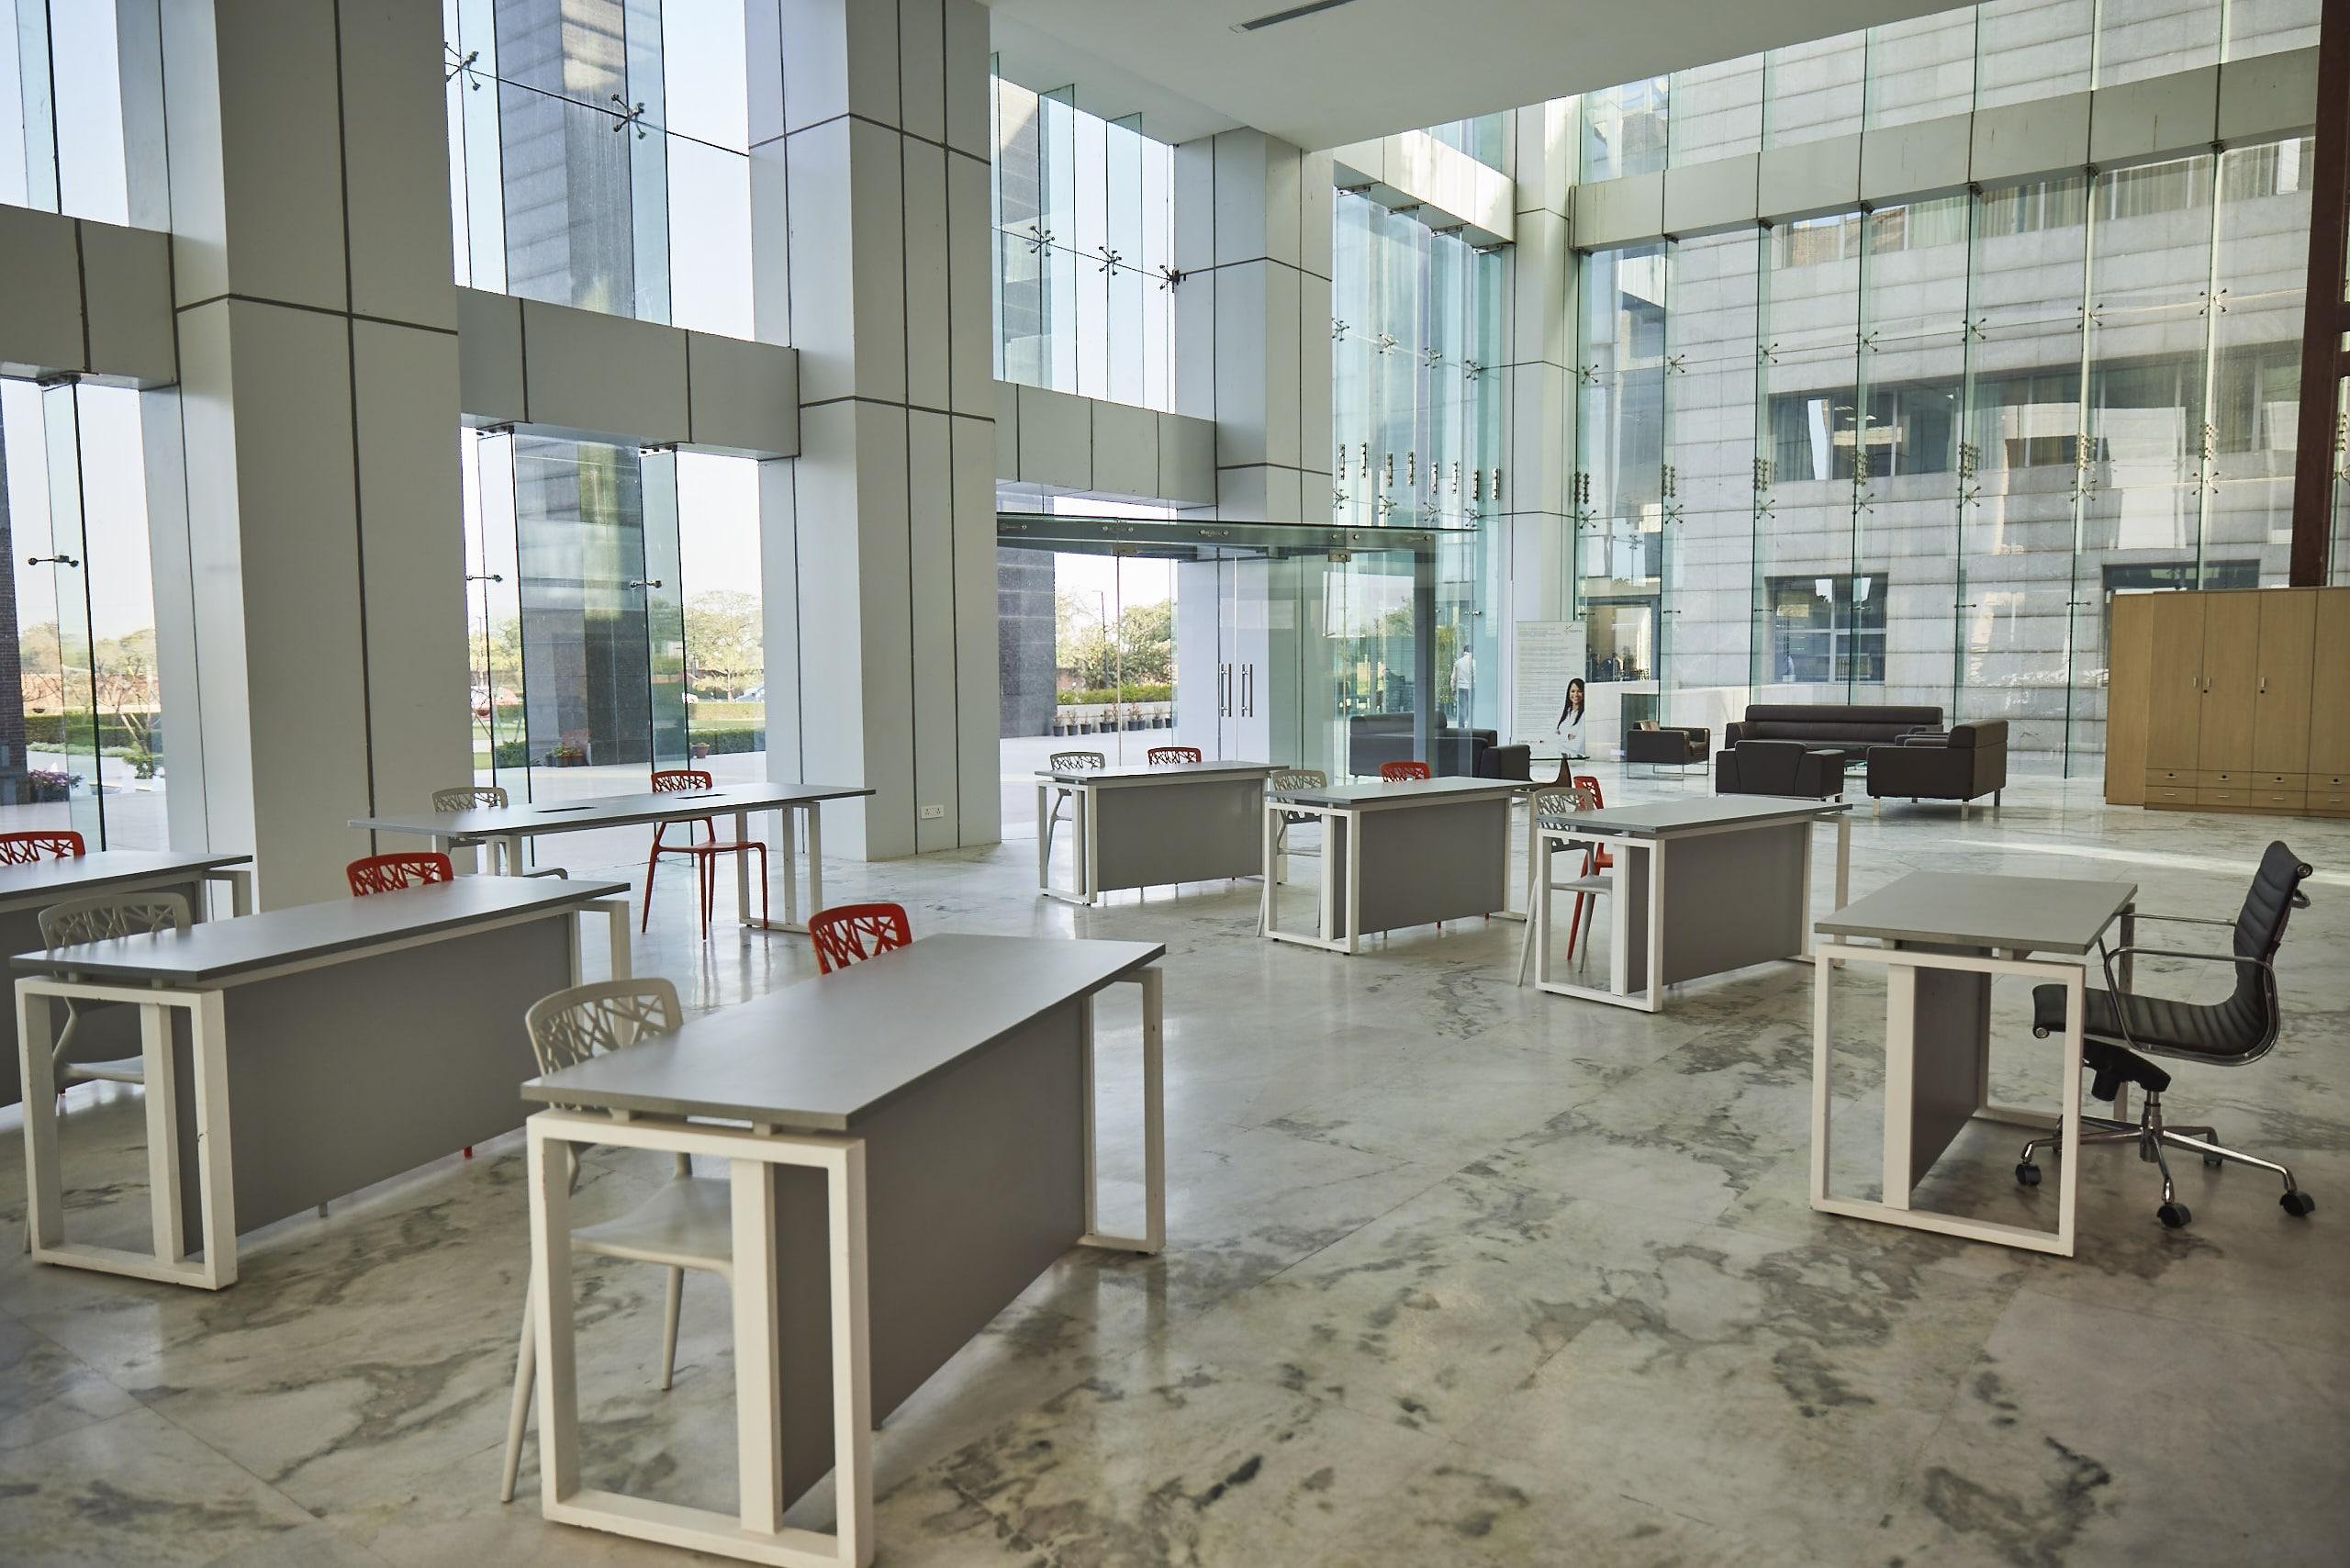 Design Studio at Vedatya Institute